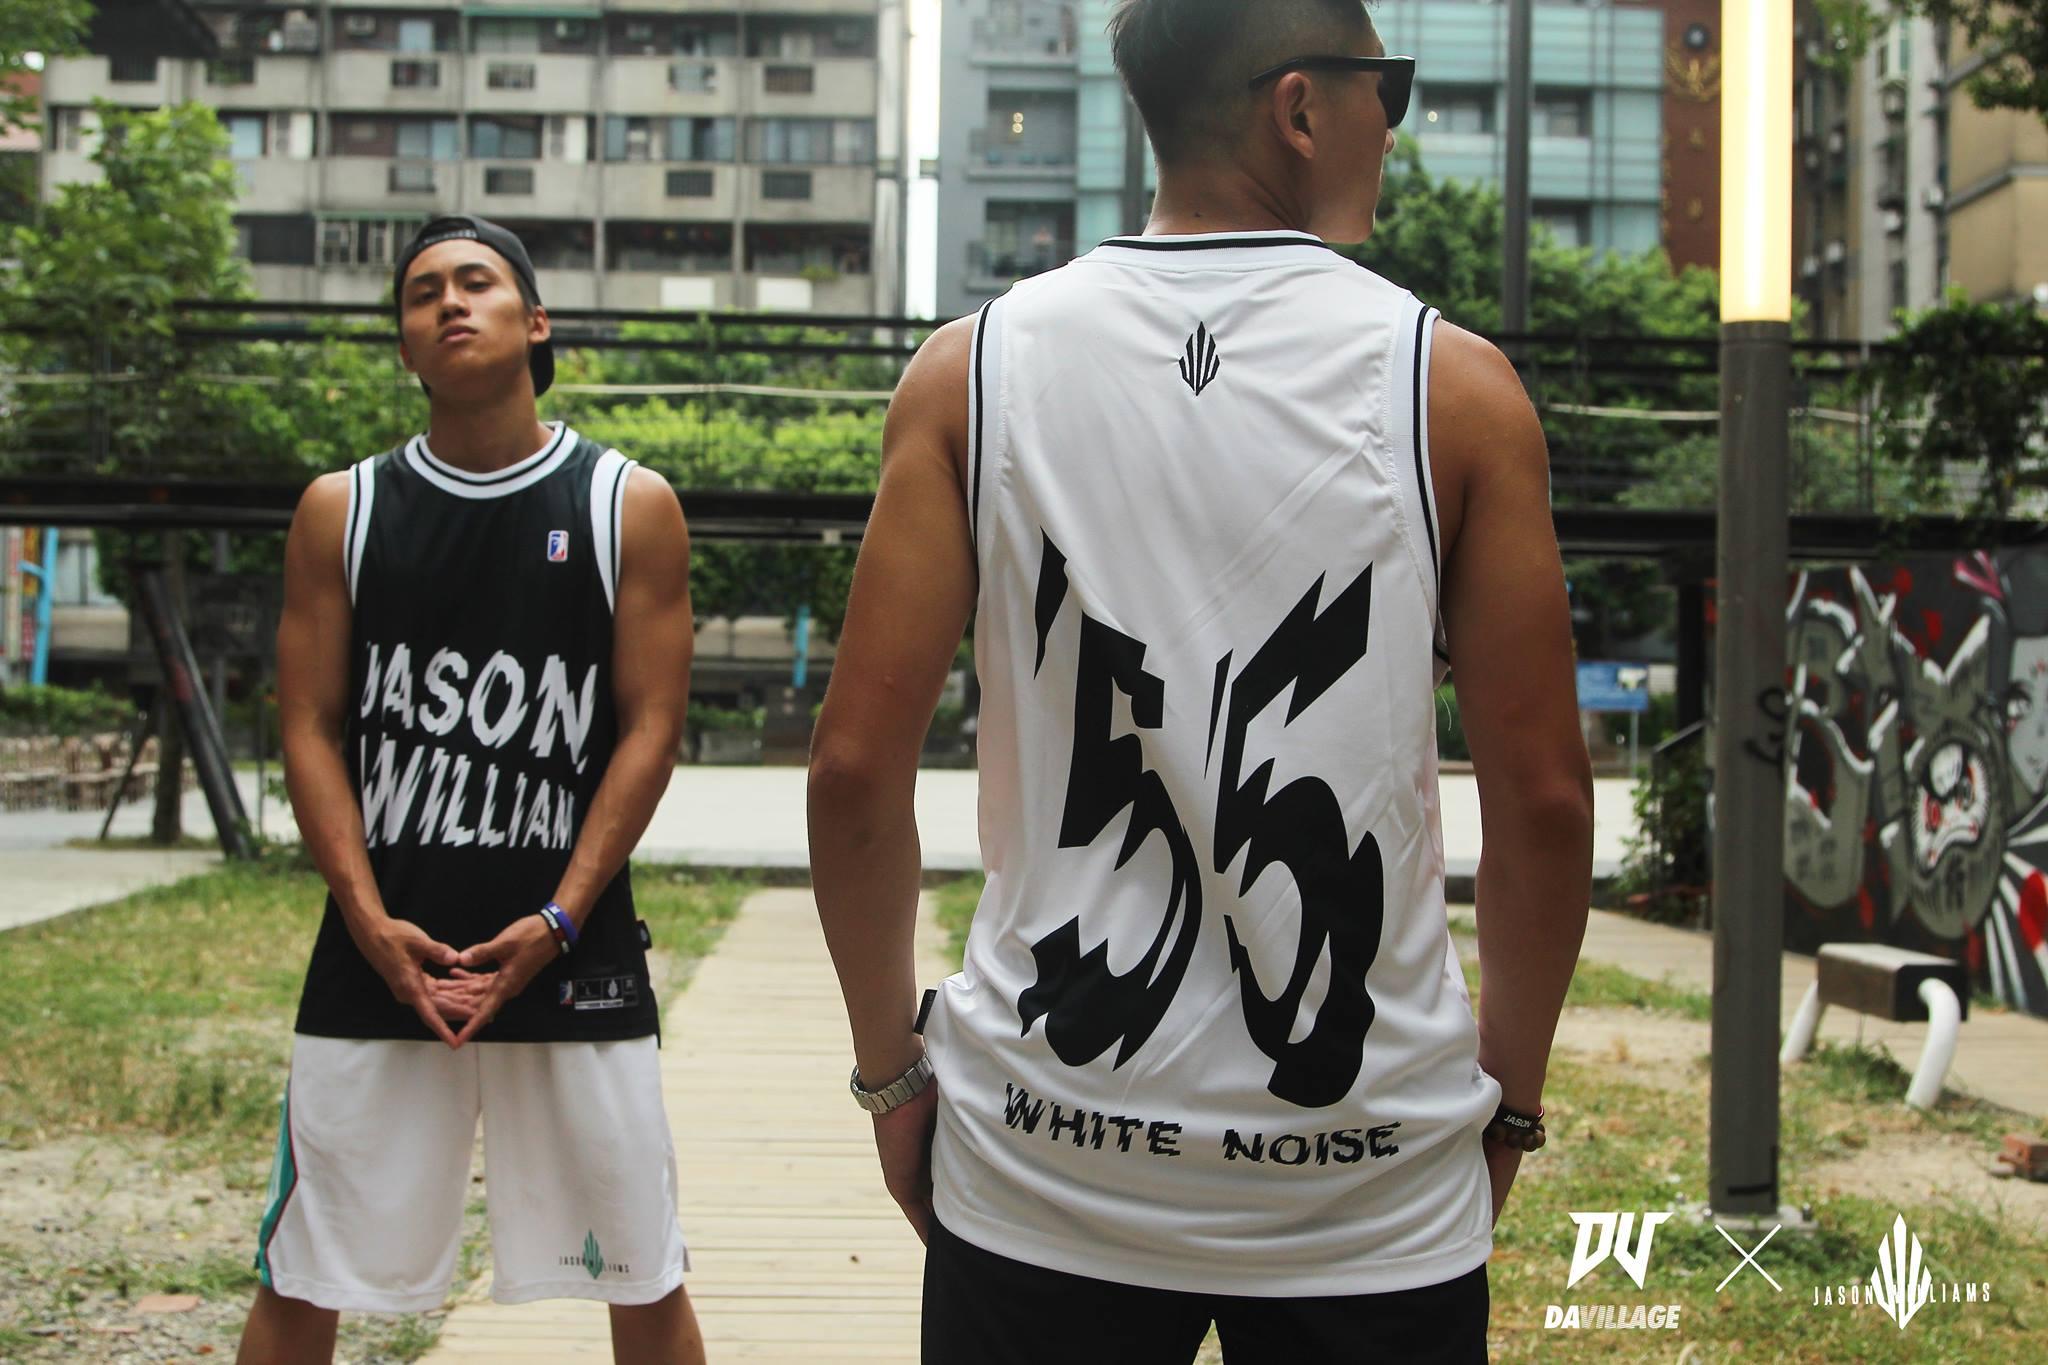 Jason Williams 2014 A/W White Chocolate 新作發表  客製團隊球衣訂製 ...